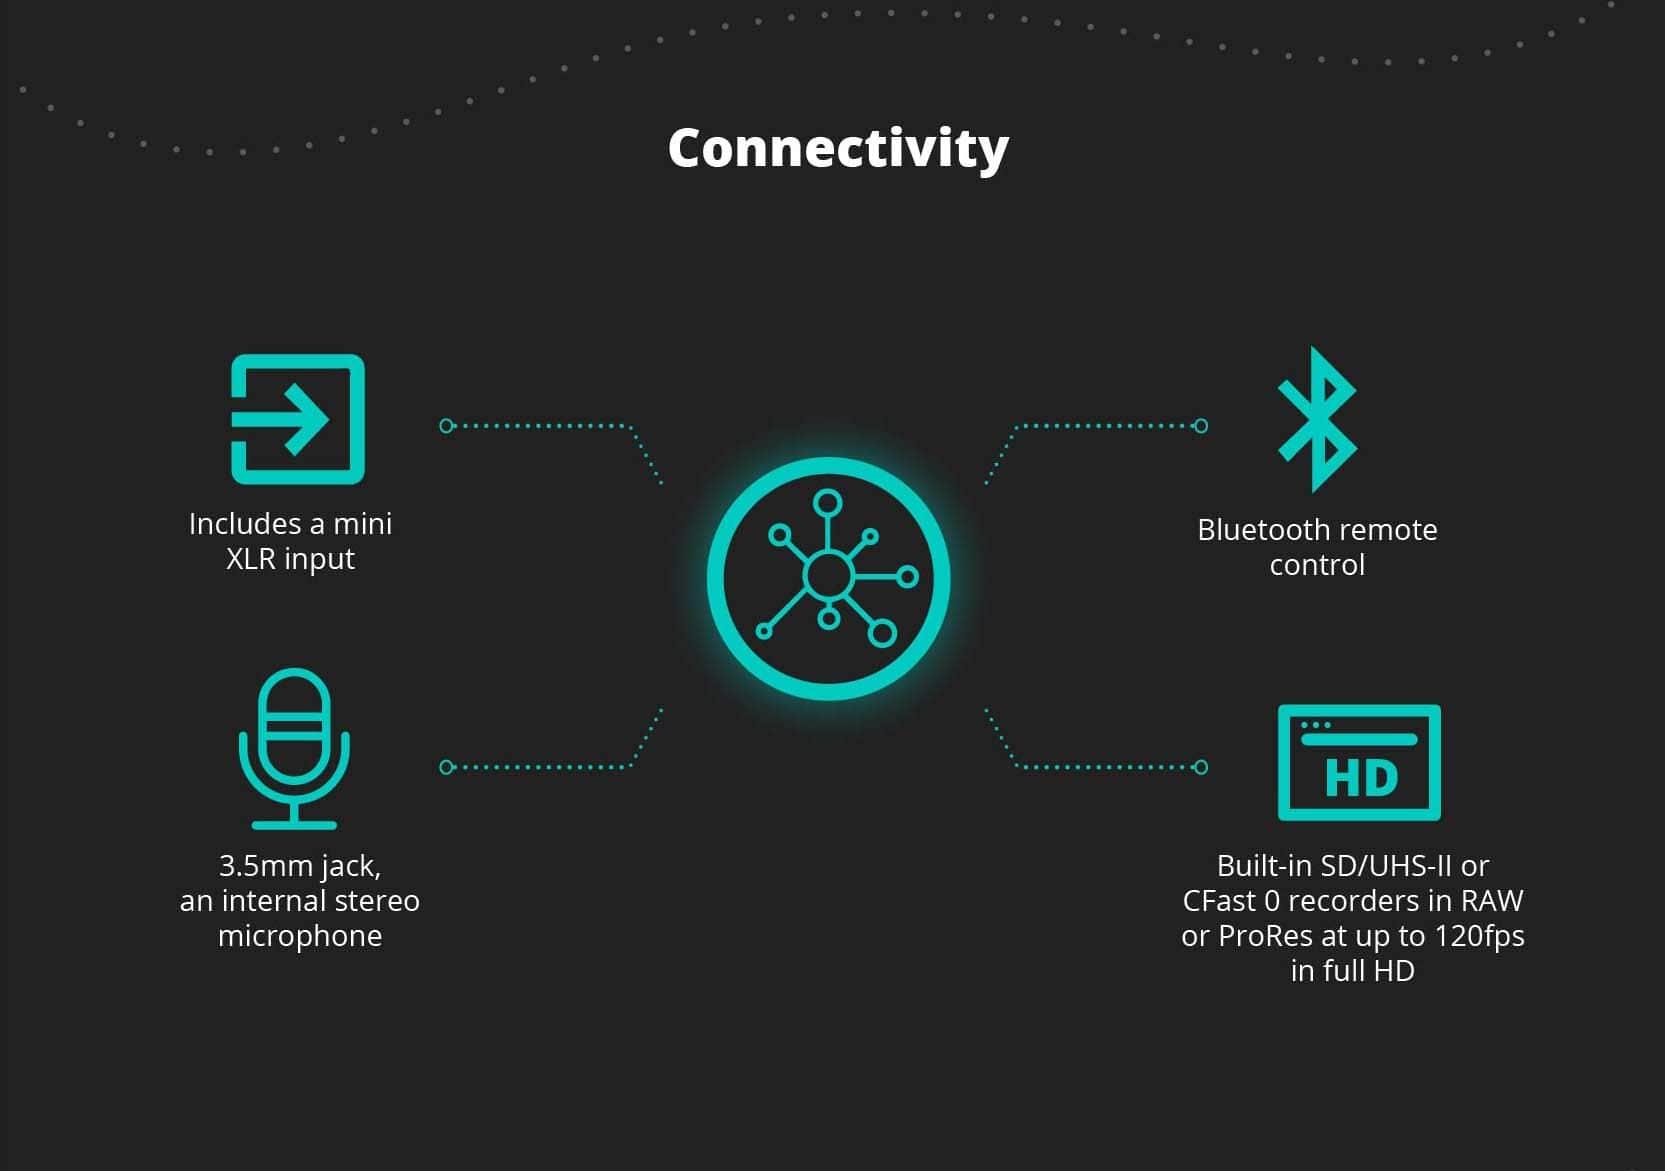 Blackmagic Pocket Cinema Camera 4K connectivity, Wi-fi, bluetooth